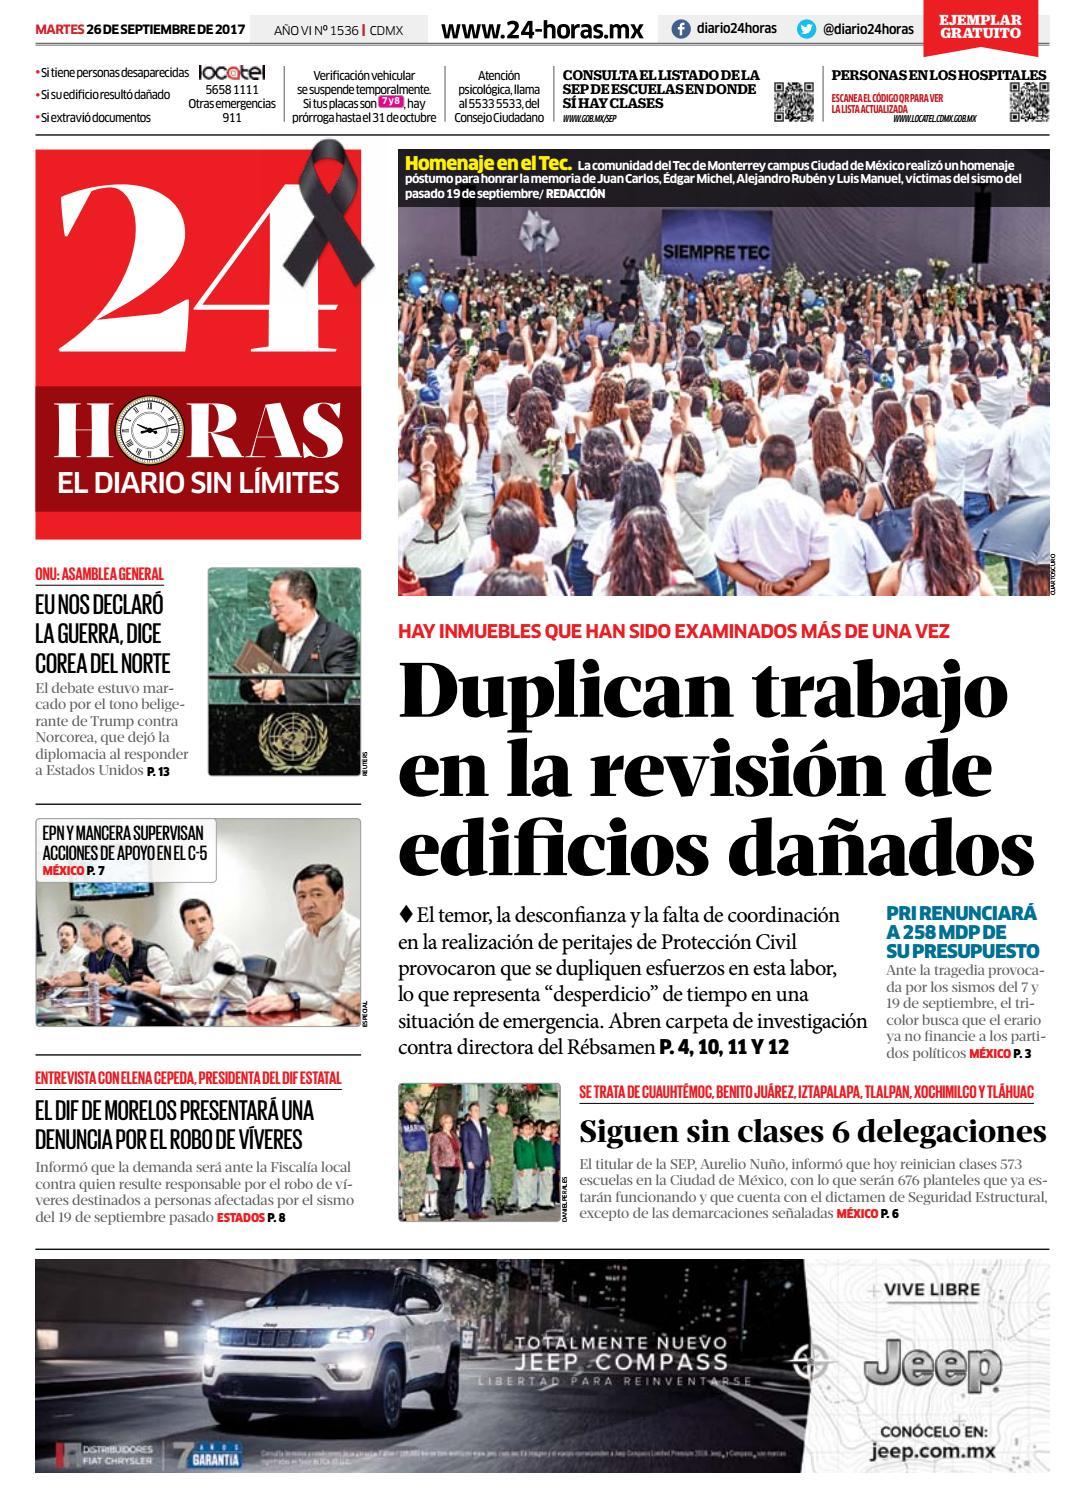 Septiembre | 26 | 2017 by Información Integral 24/7 SAPI de C.V. - issuu